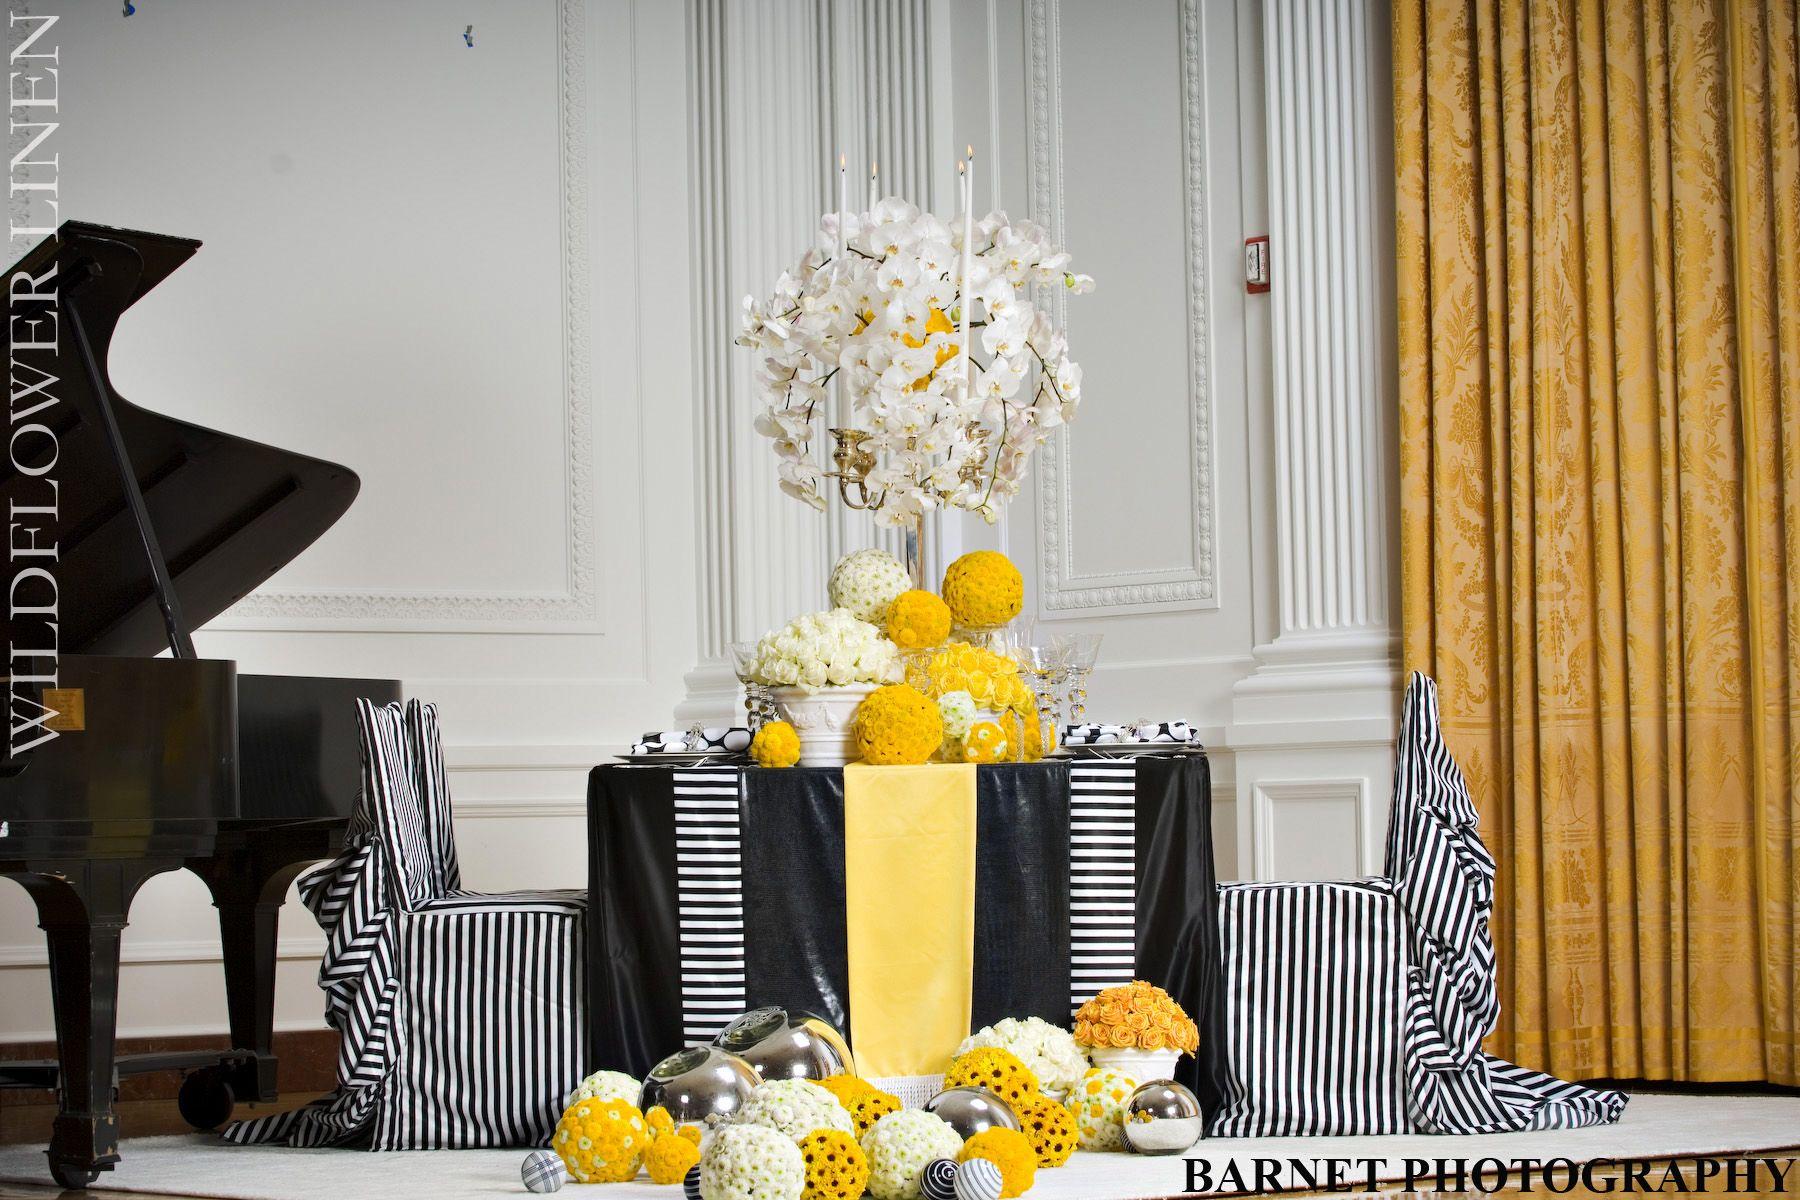 Pin by Jessie Medina on my wedding | Pinterest | Nice, Tablescapes ...